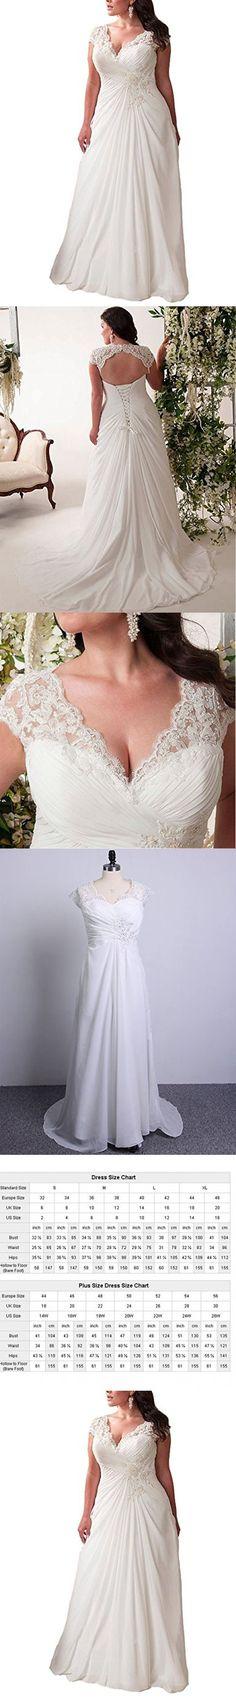 Mulanbridal Elegant Applique Lace Wedding Dress Chiffon V Neck Plus Size Beach Bridal Gowns White 18